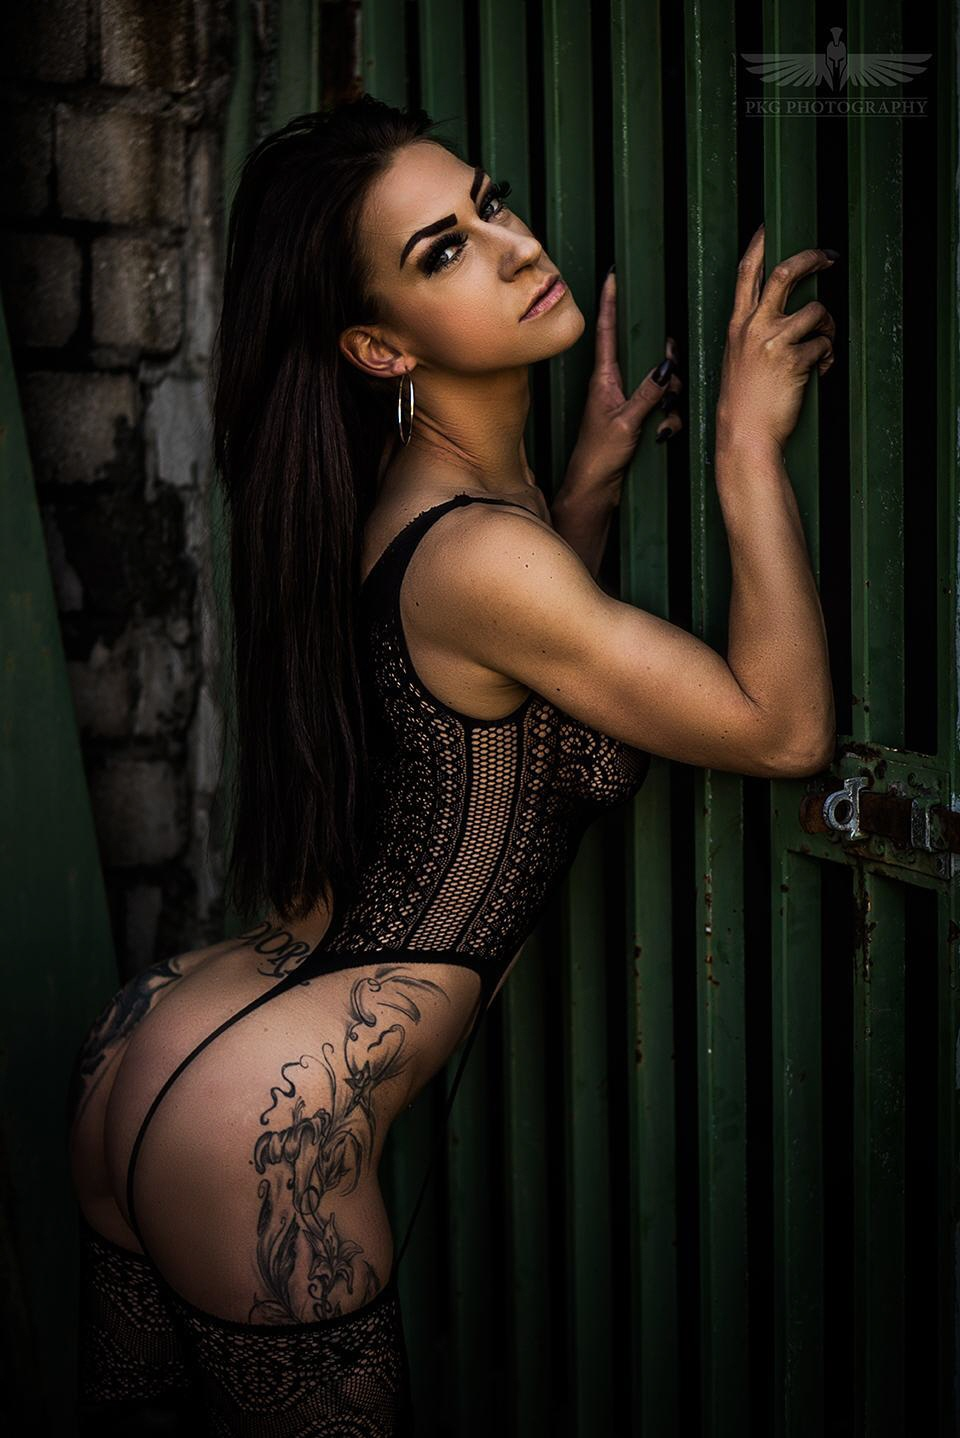 Striperin